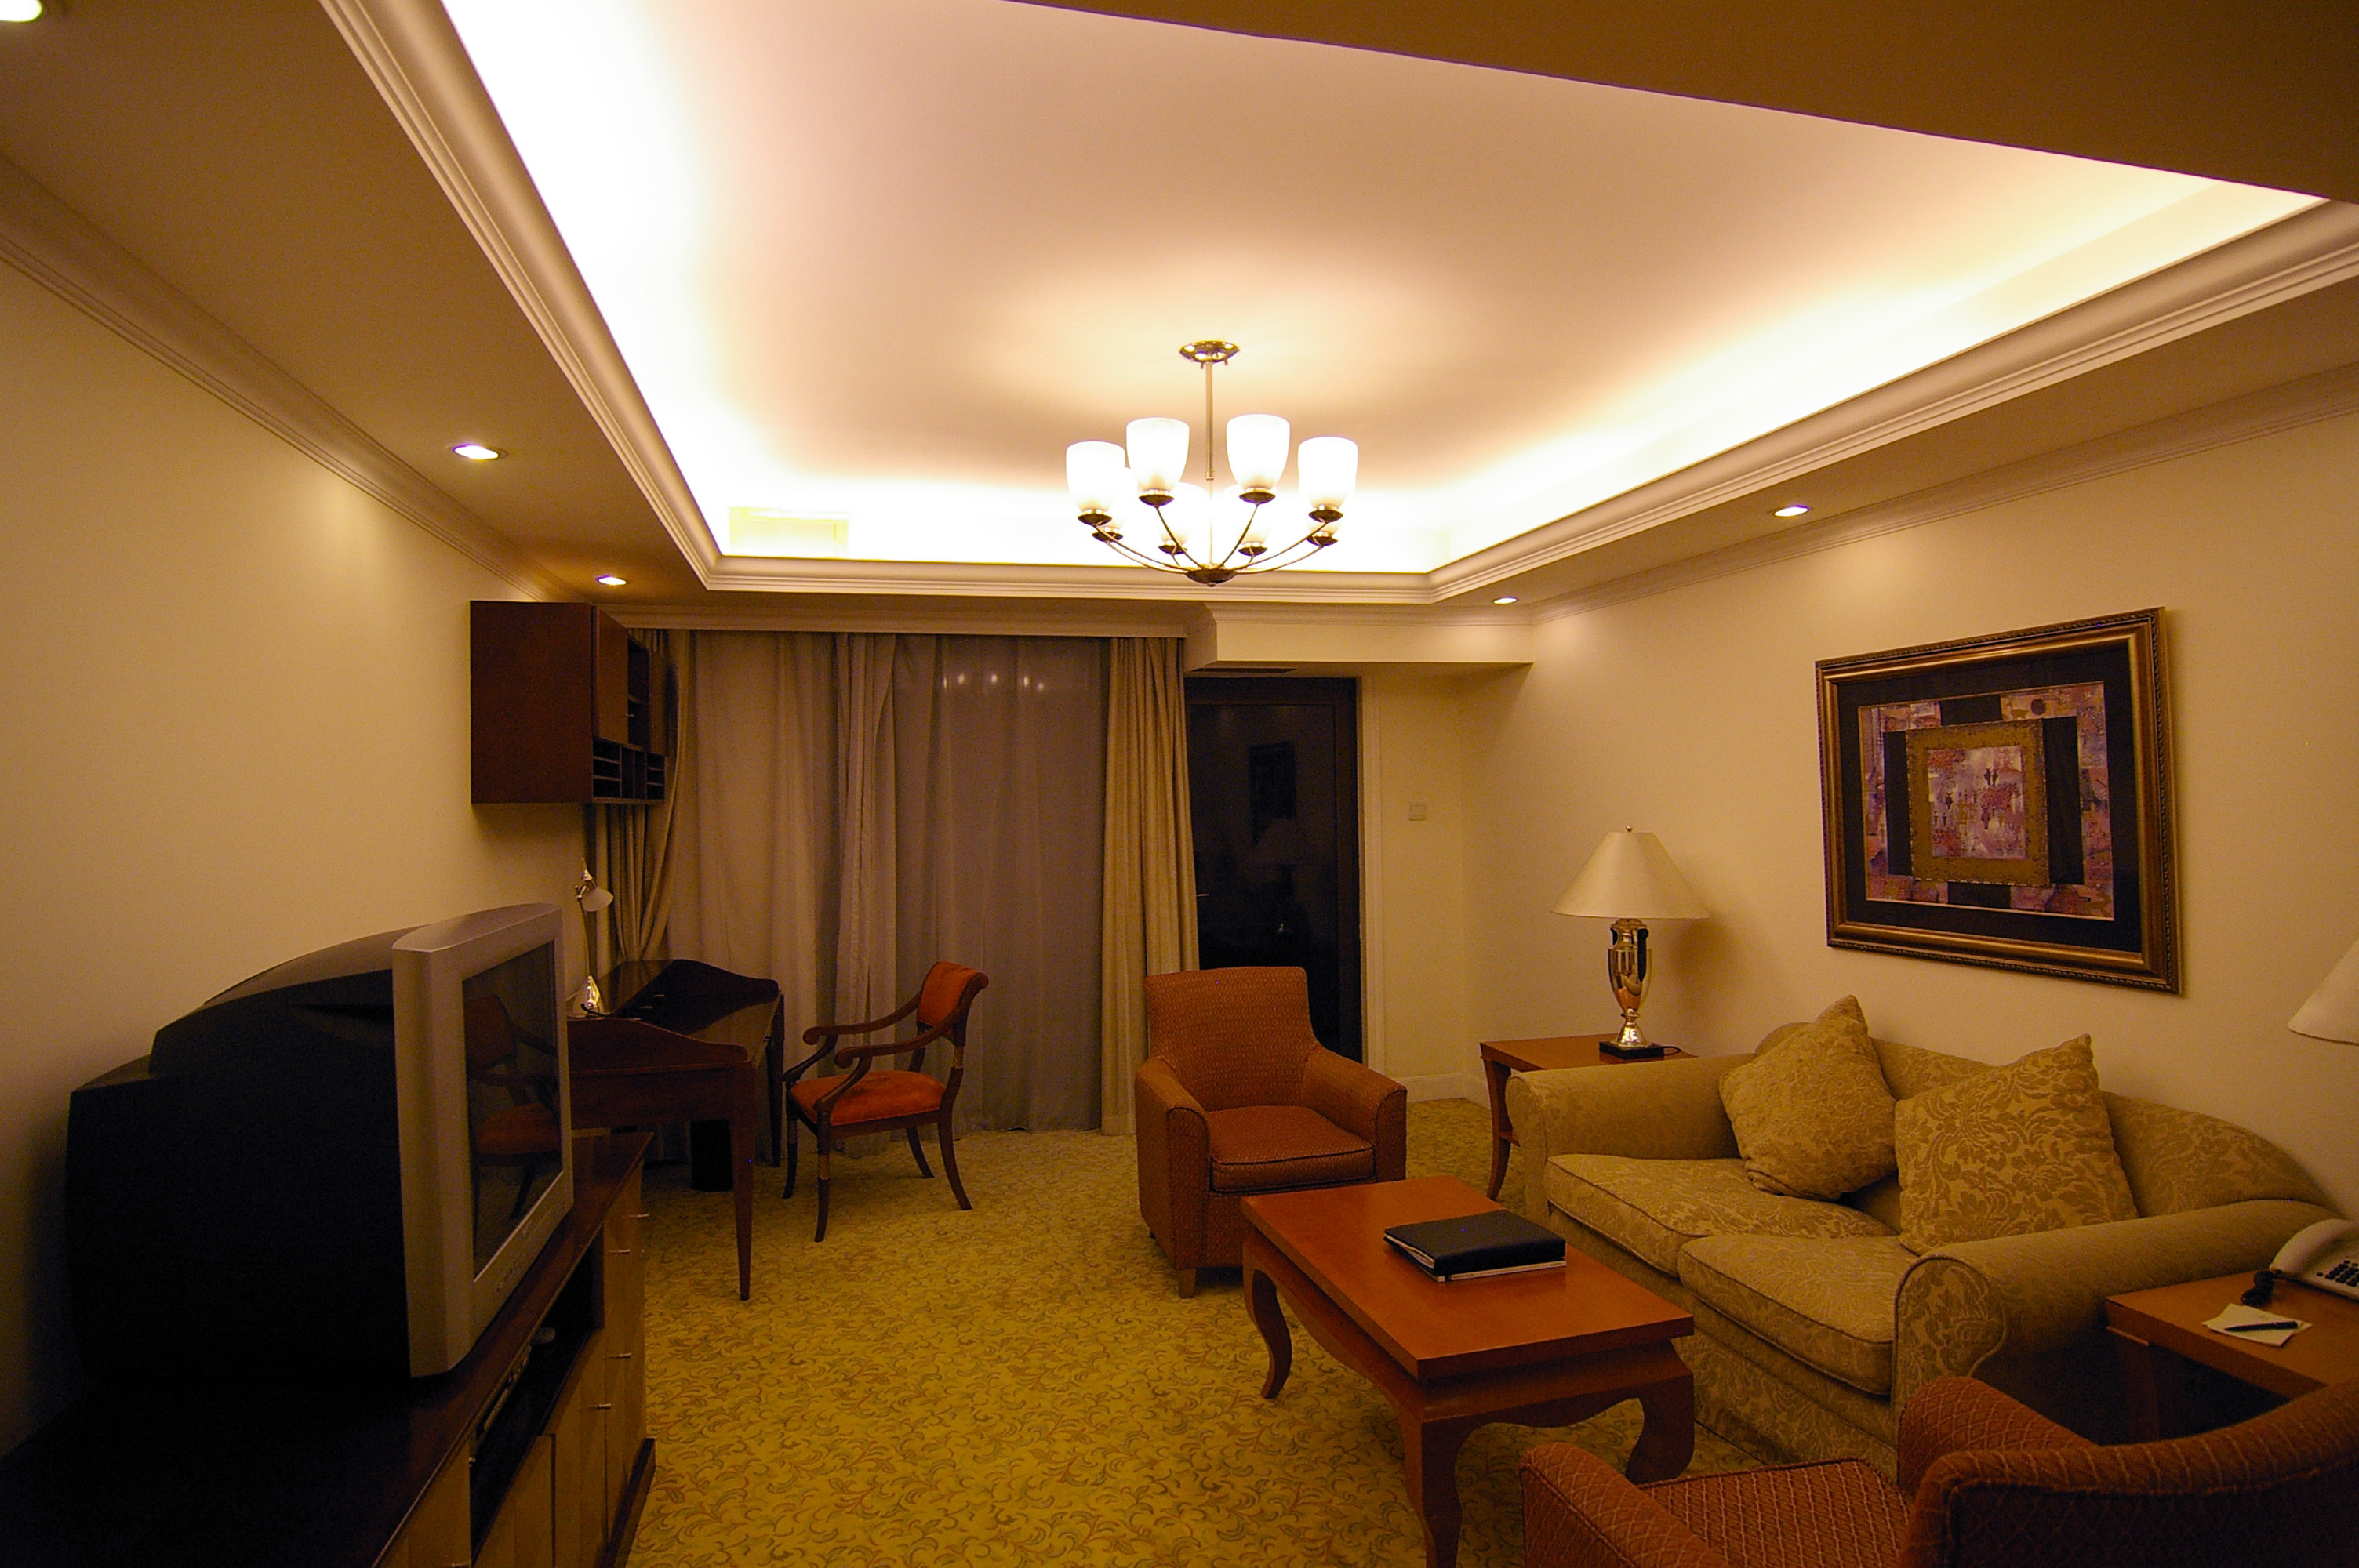 Small Apartment Room Decorating Ideas